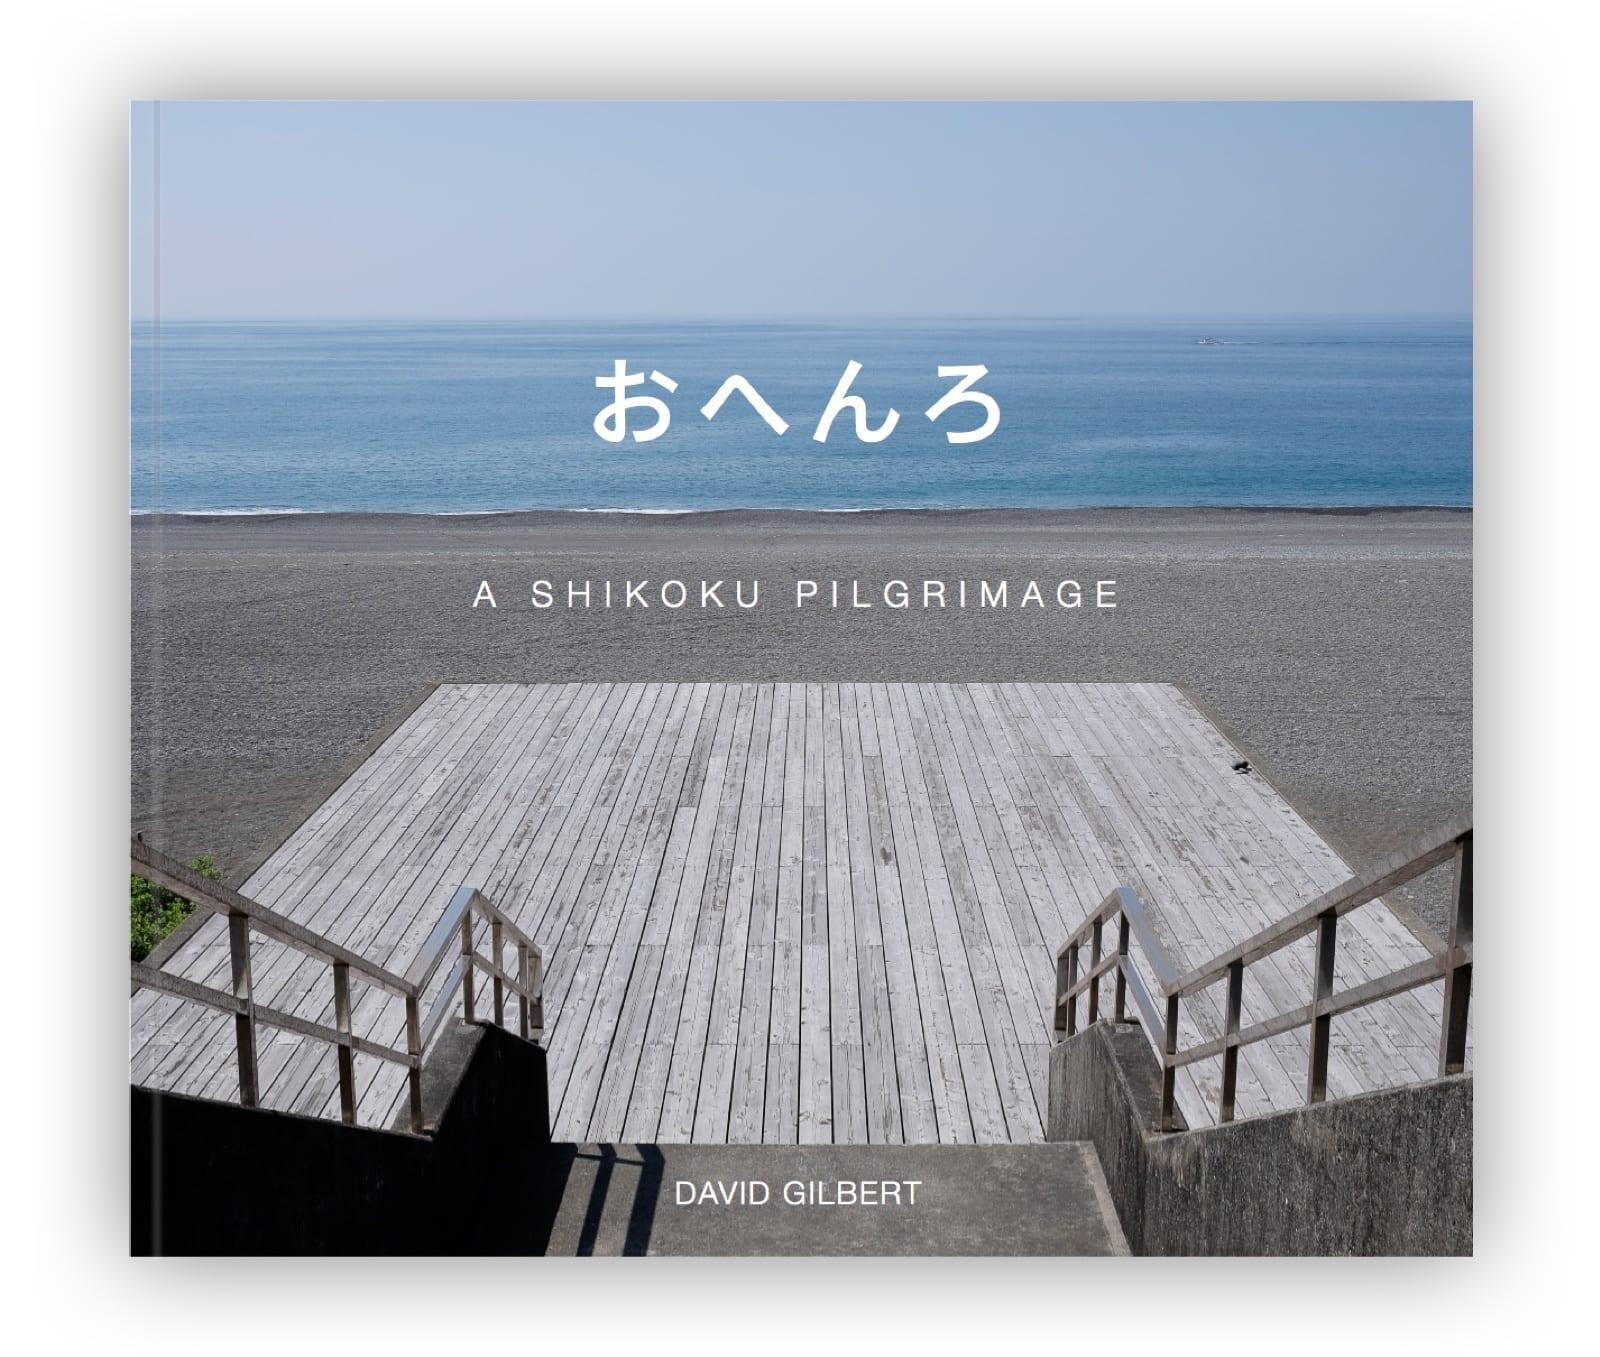 Shikoku Pilgrimage Photo Book